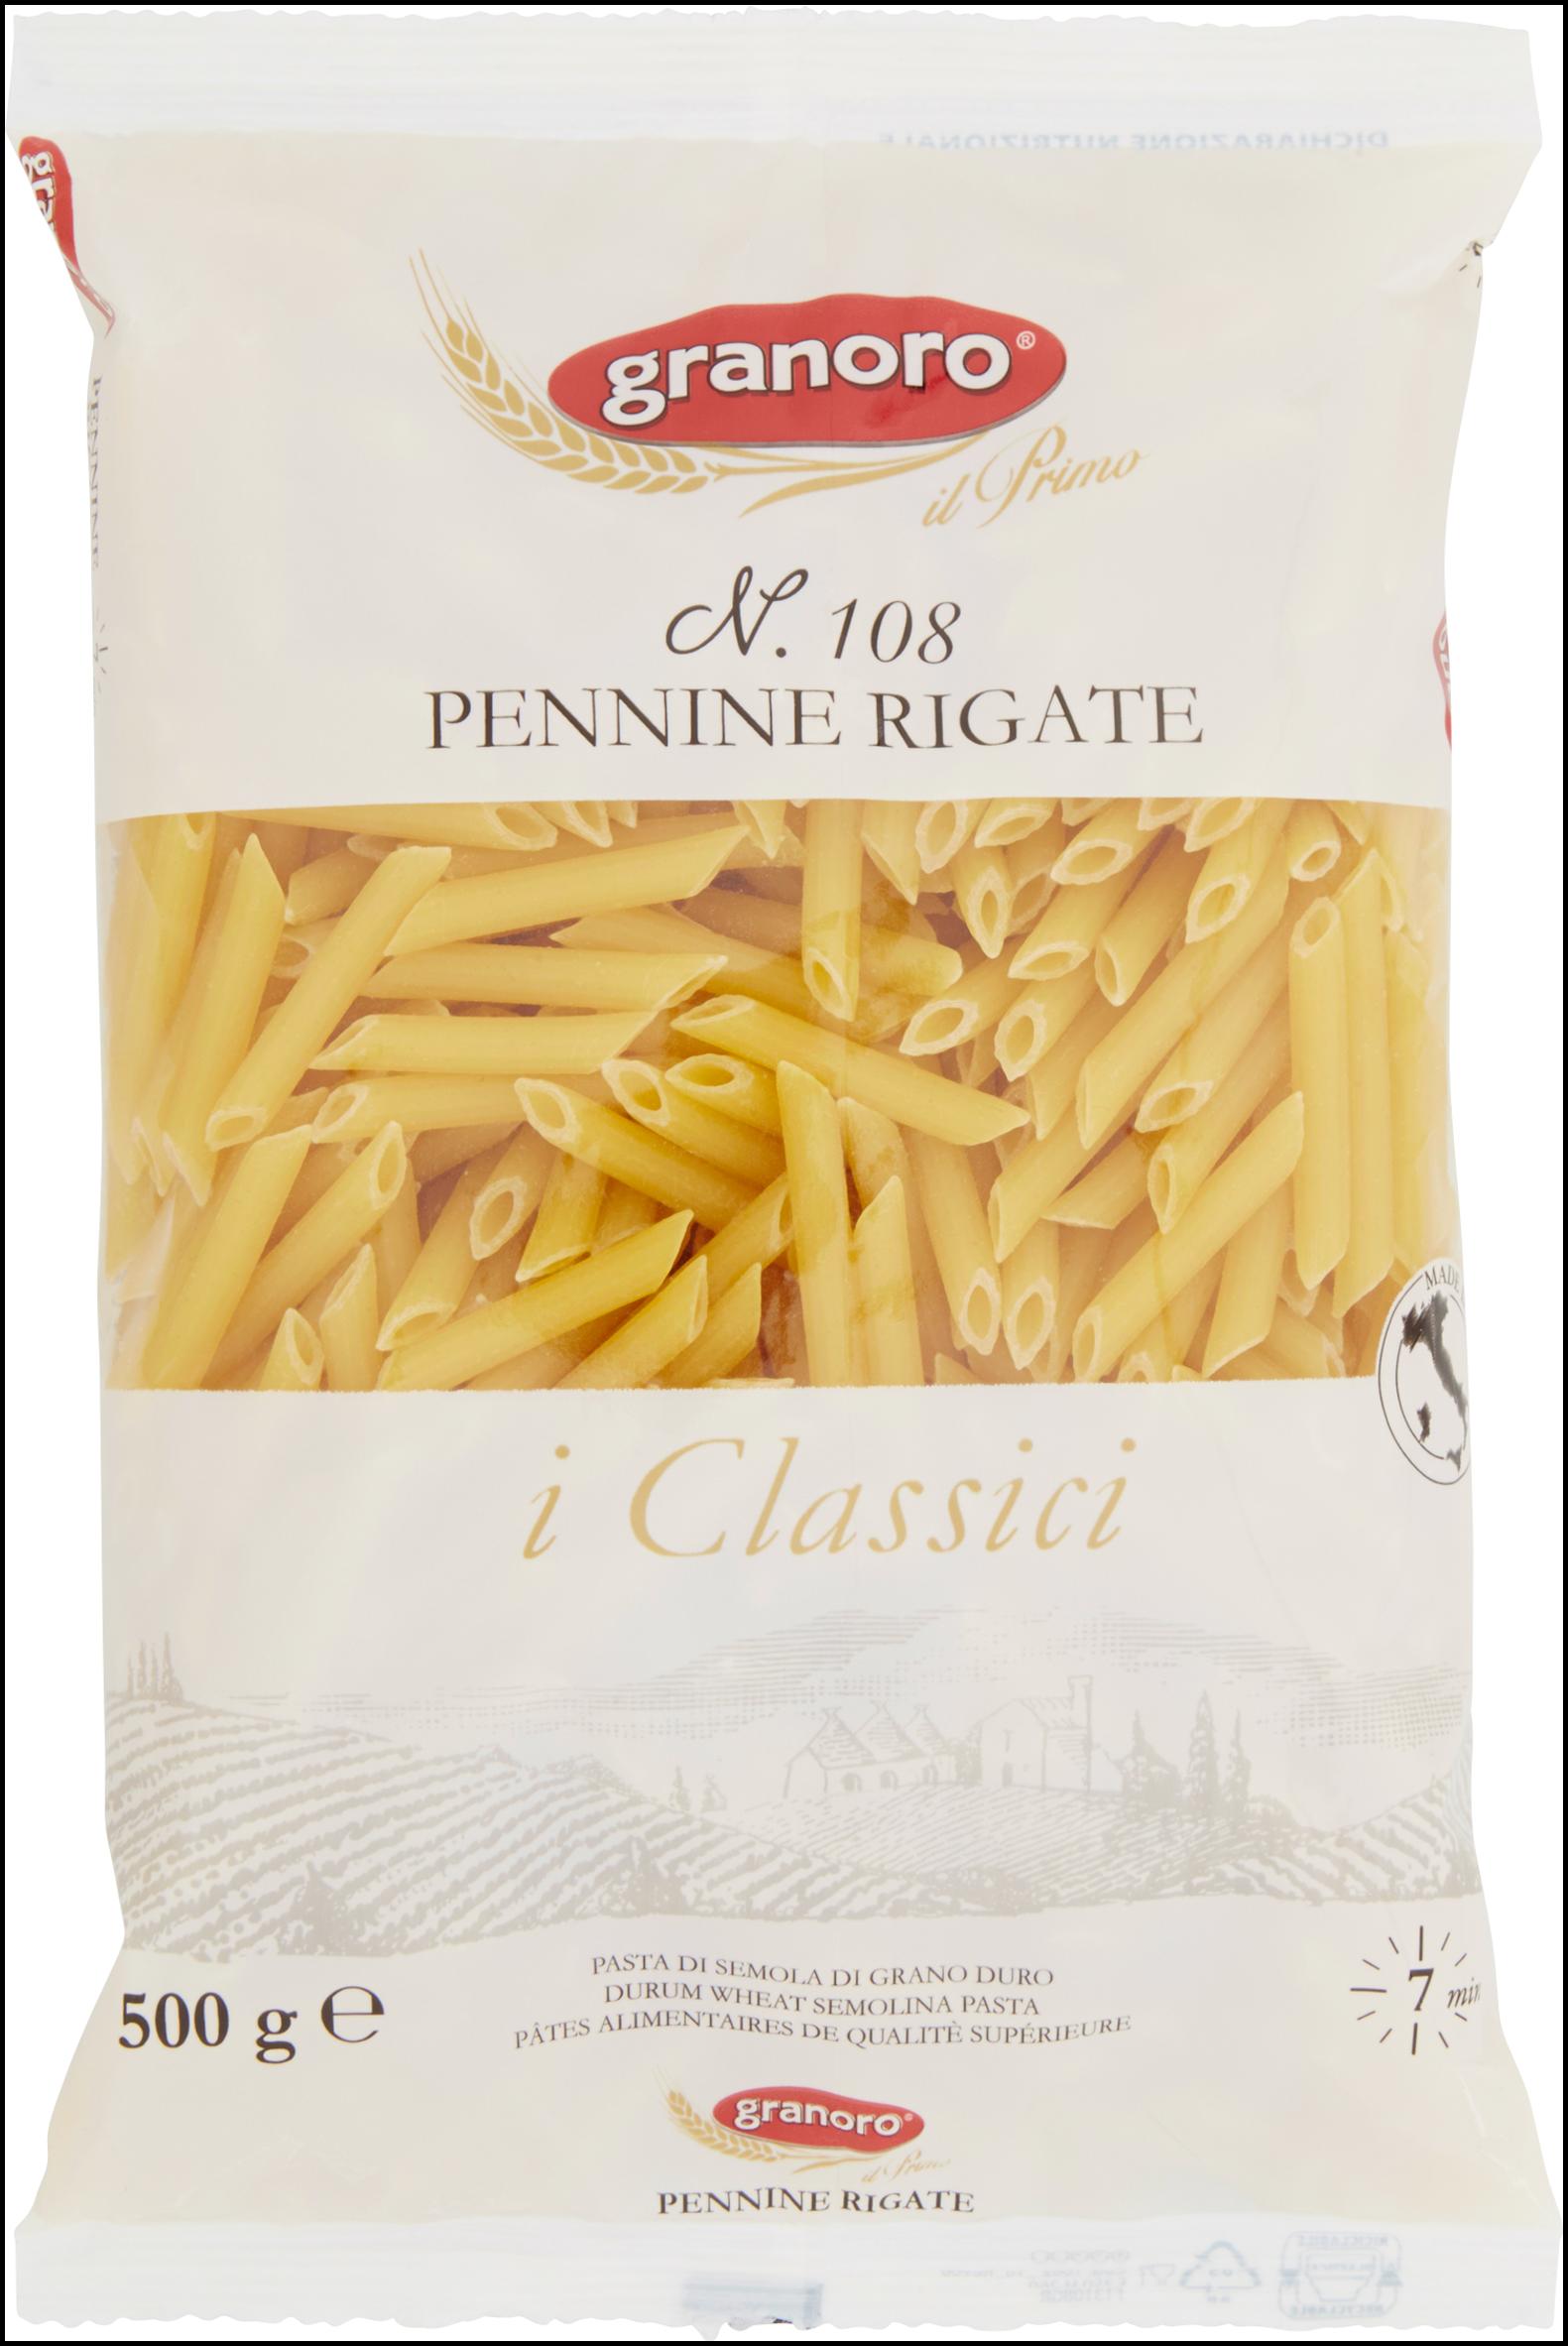 PENNINE RIGATE GRANORO 500G N.108